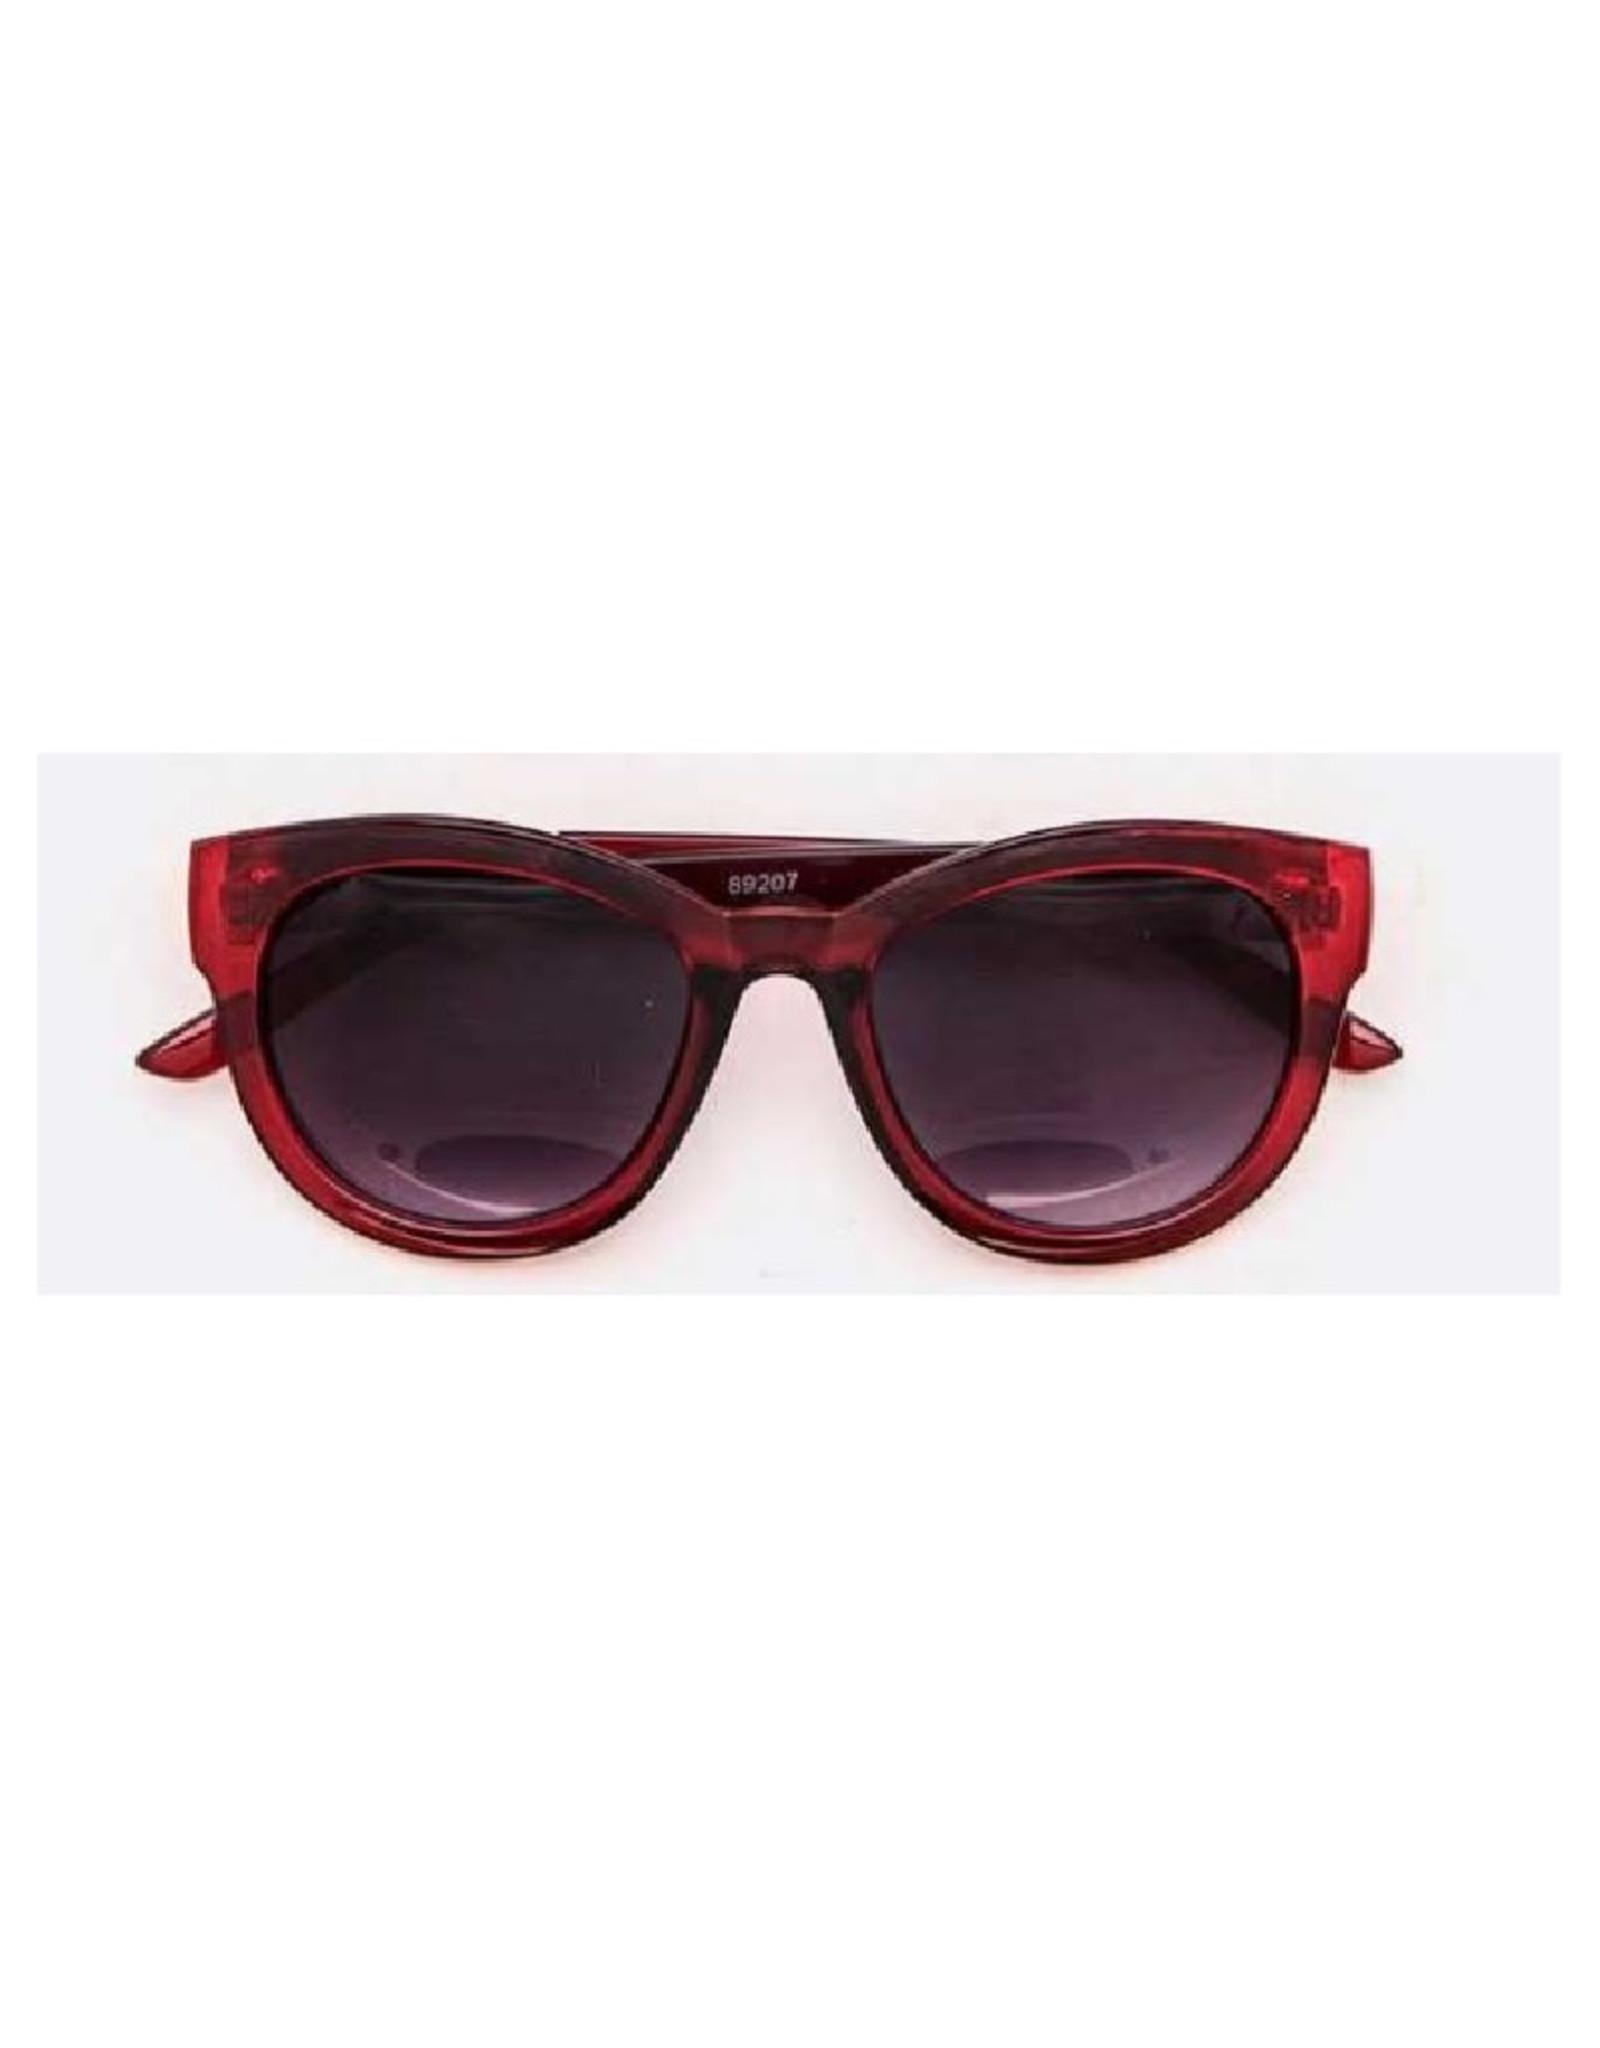 Sunglasses - Red Frame